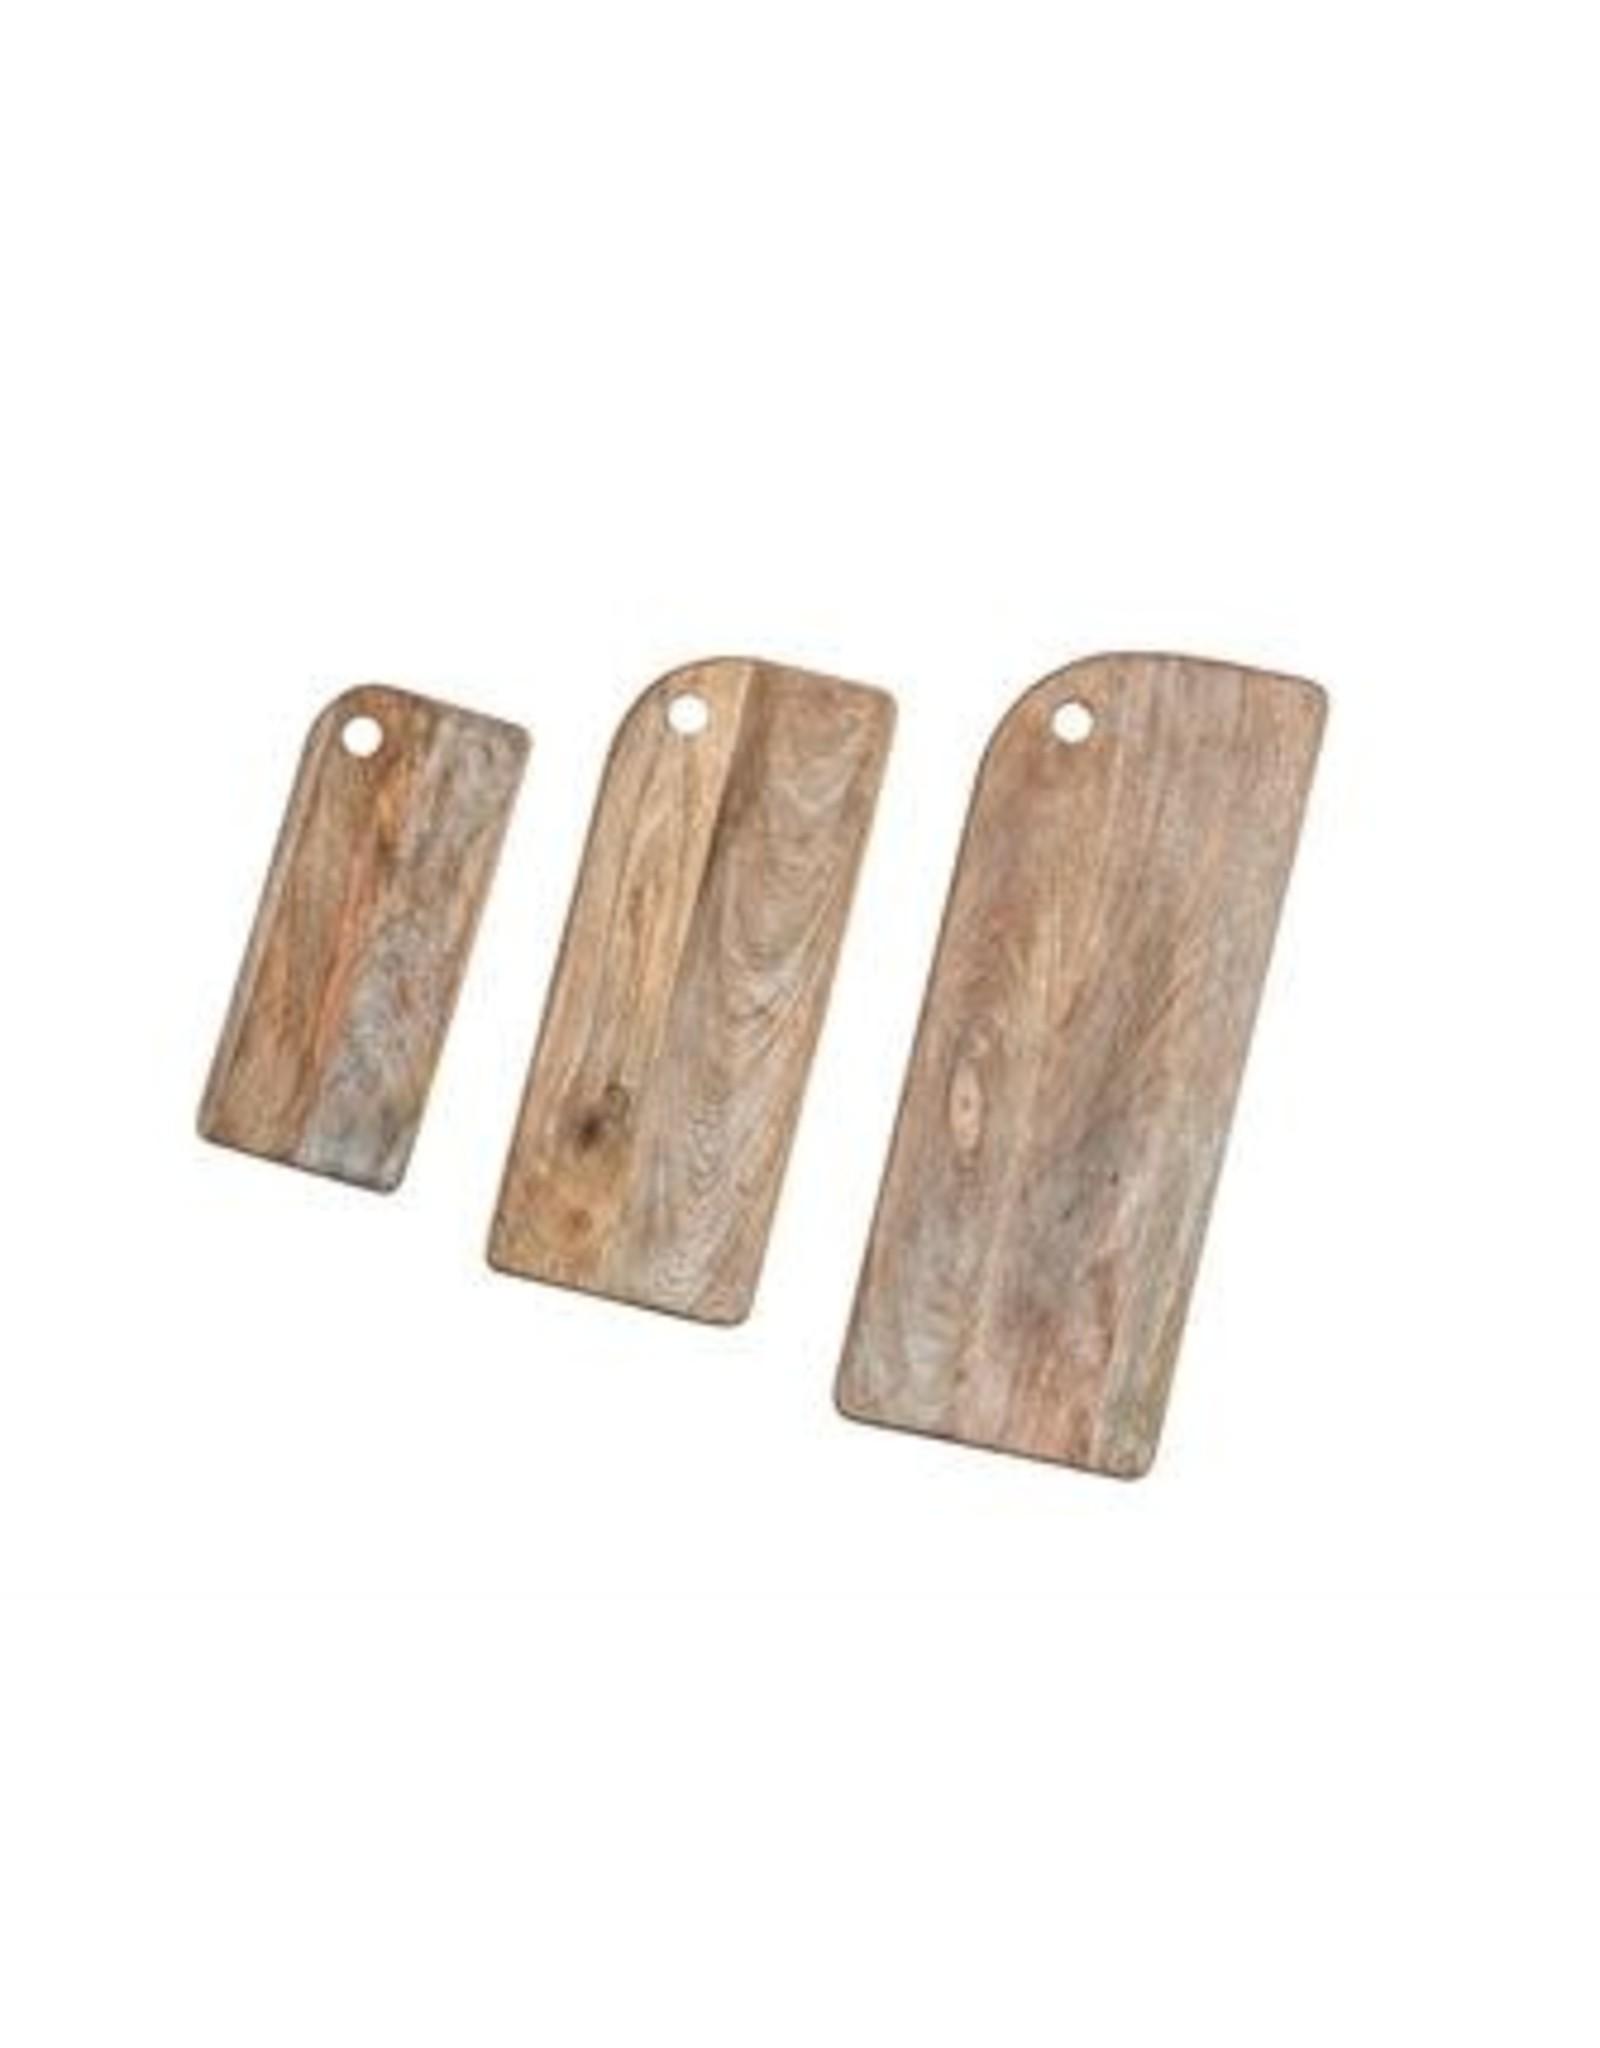 Mango Wood Cheese Cutting Board - small